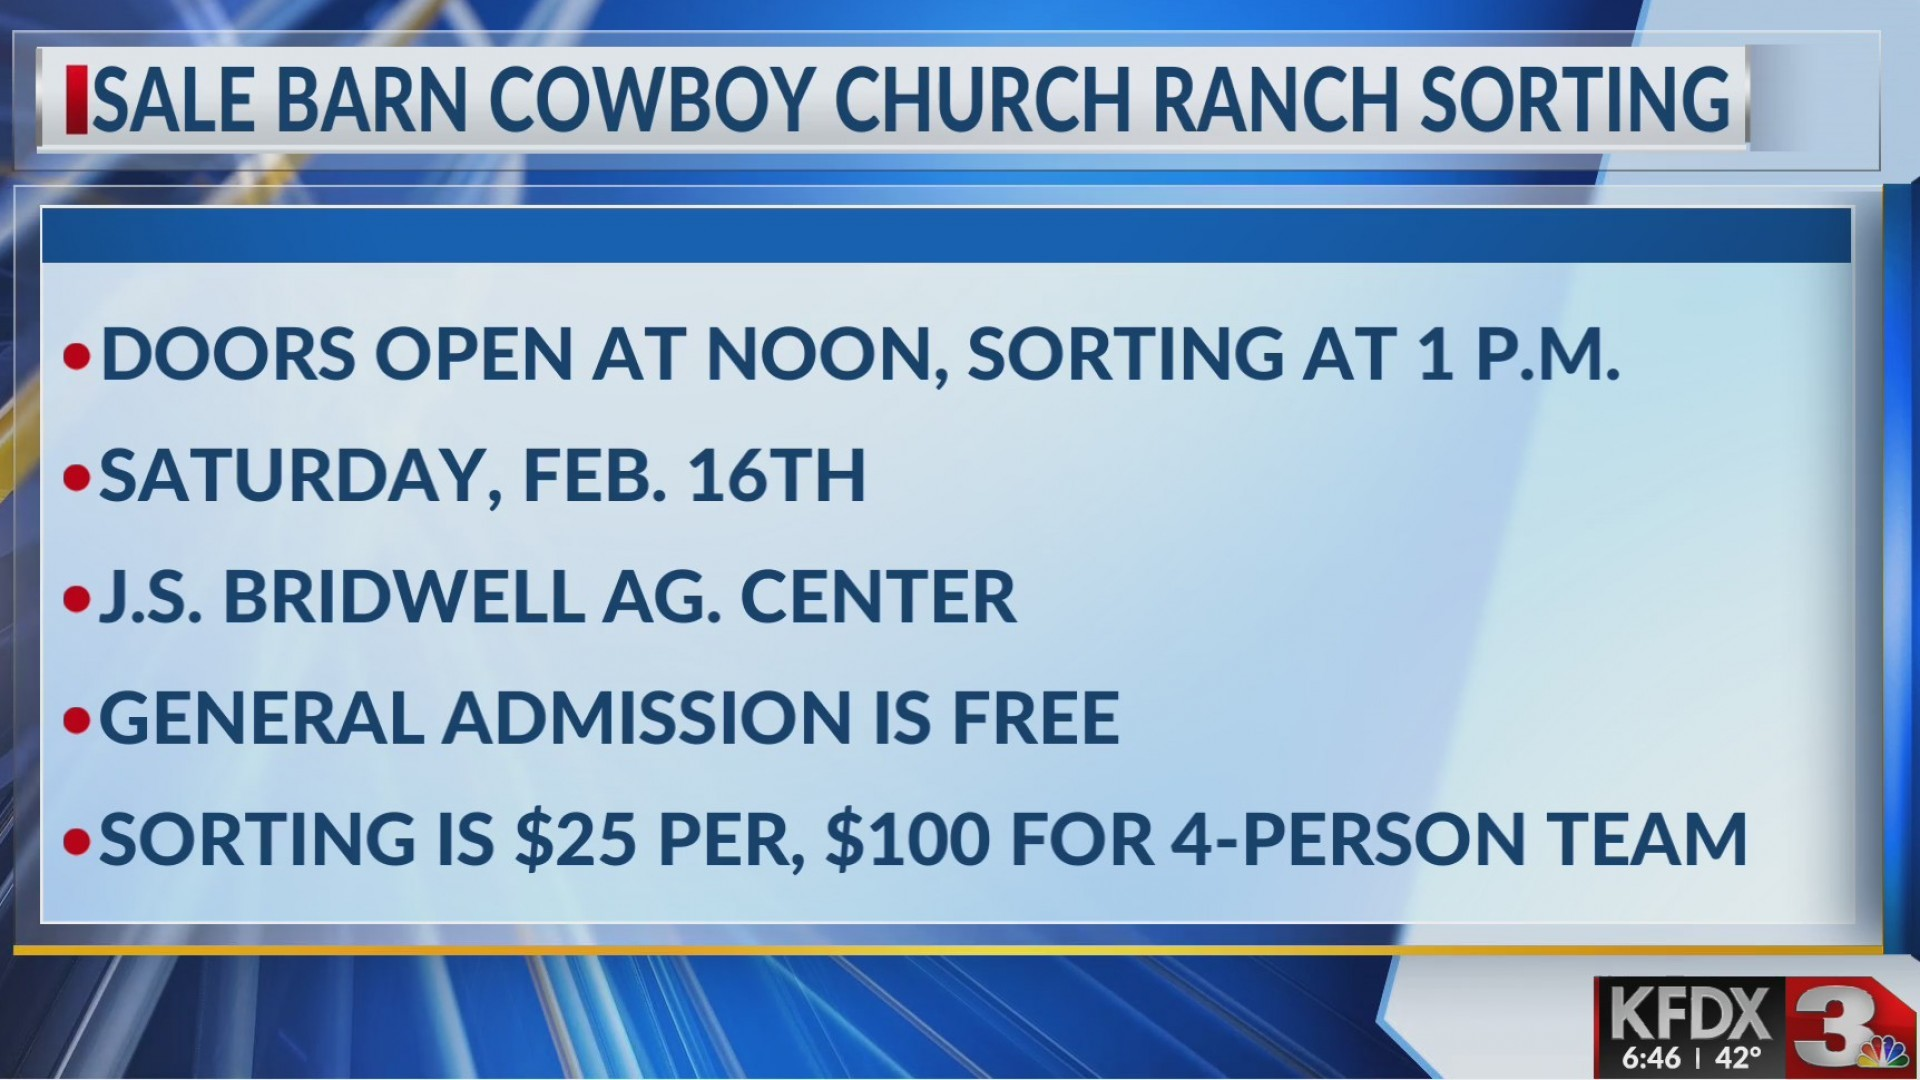 Sale_Barn_Cowboy_Church_Ranch_Sorting_0_20190205125932